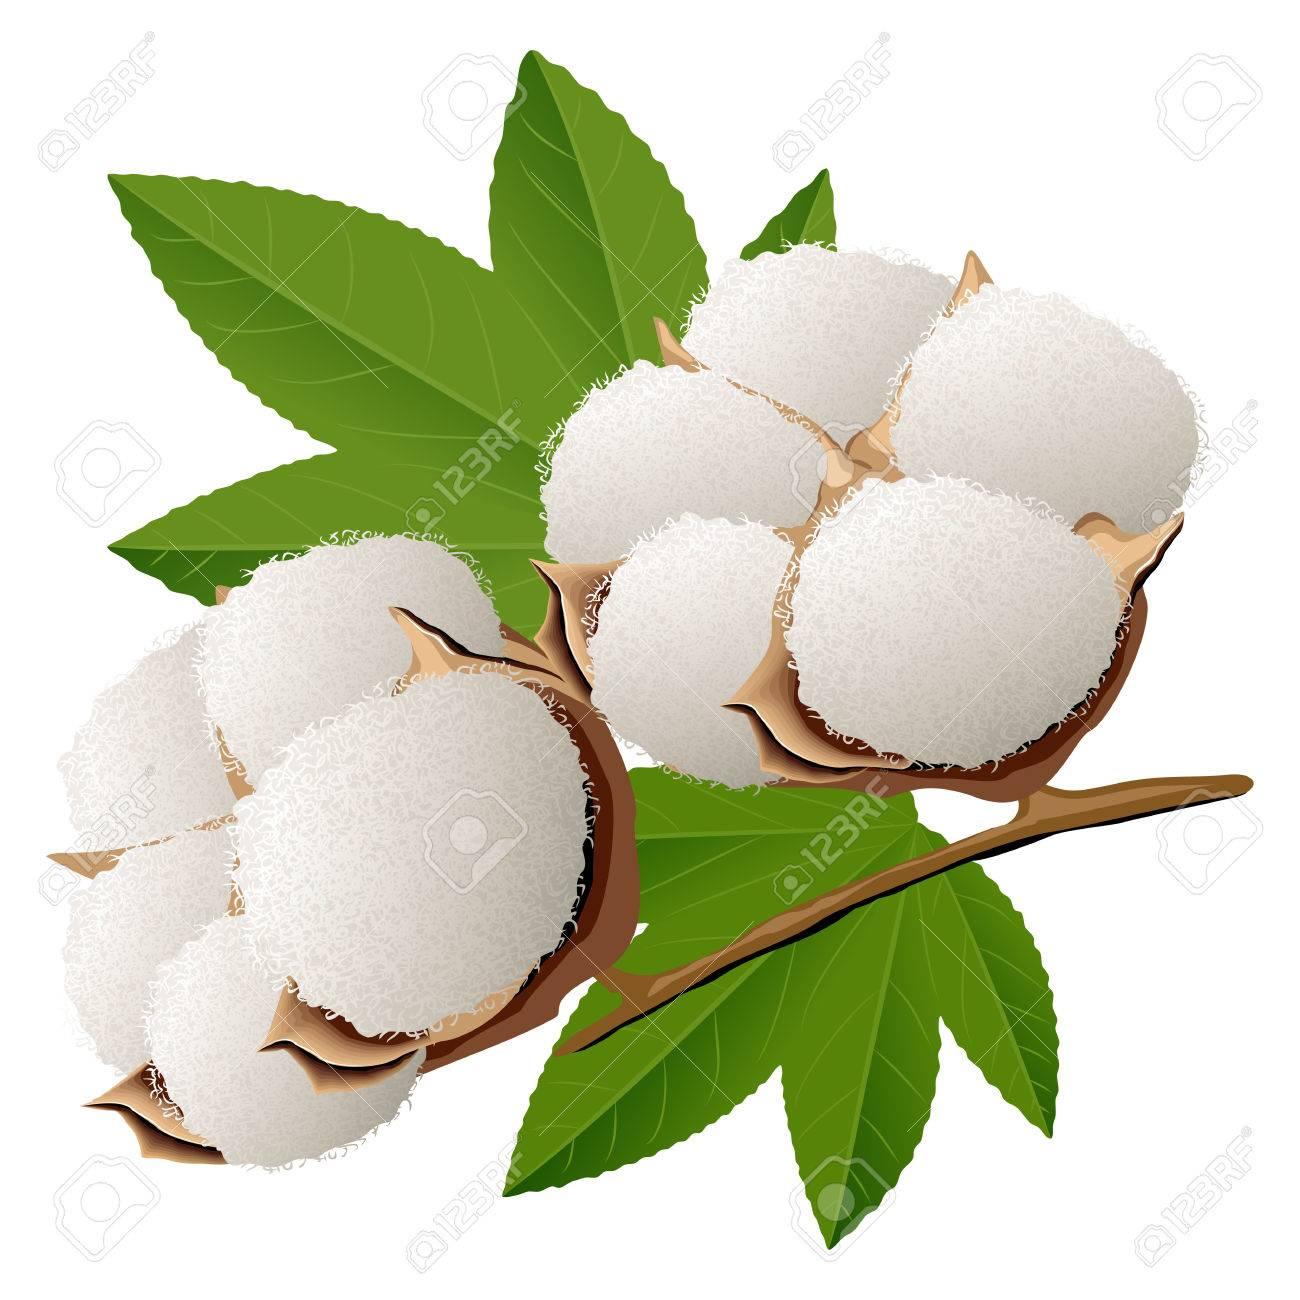 Realistic cotton branch vector illustration - 66927366